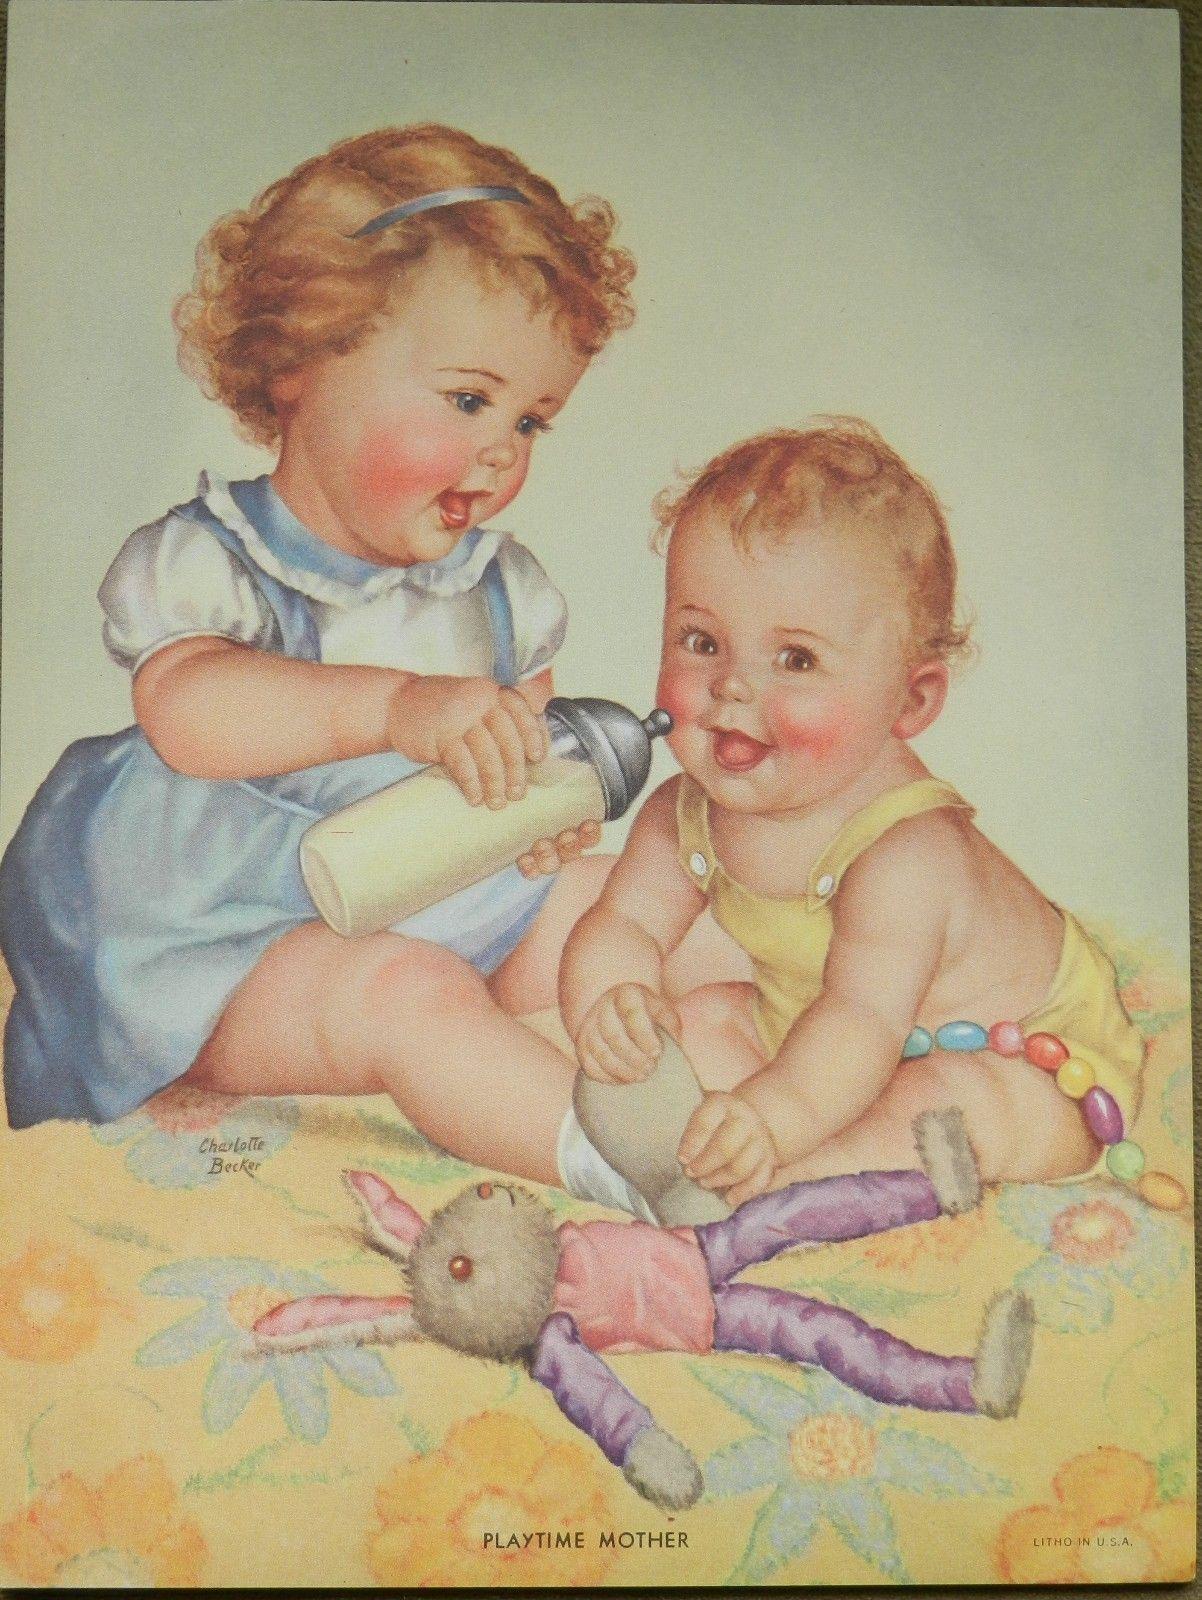 Charlotte Becker - Playtime Mother (1202×1600)